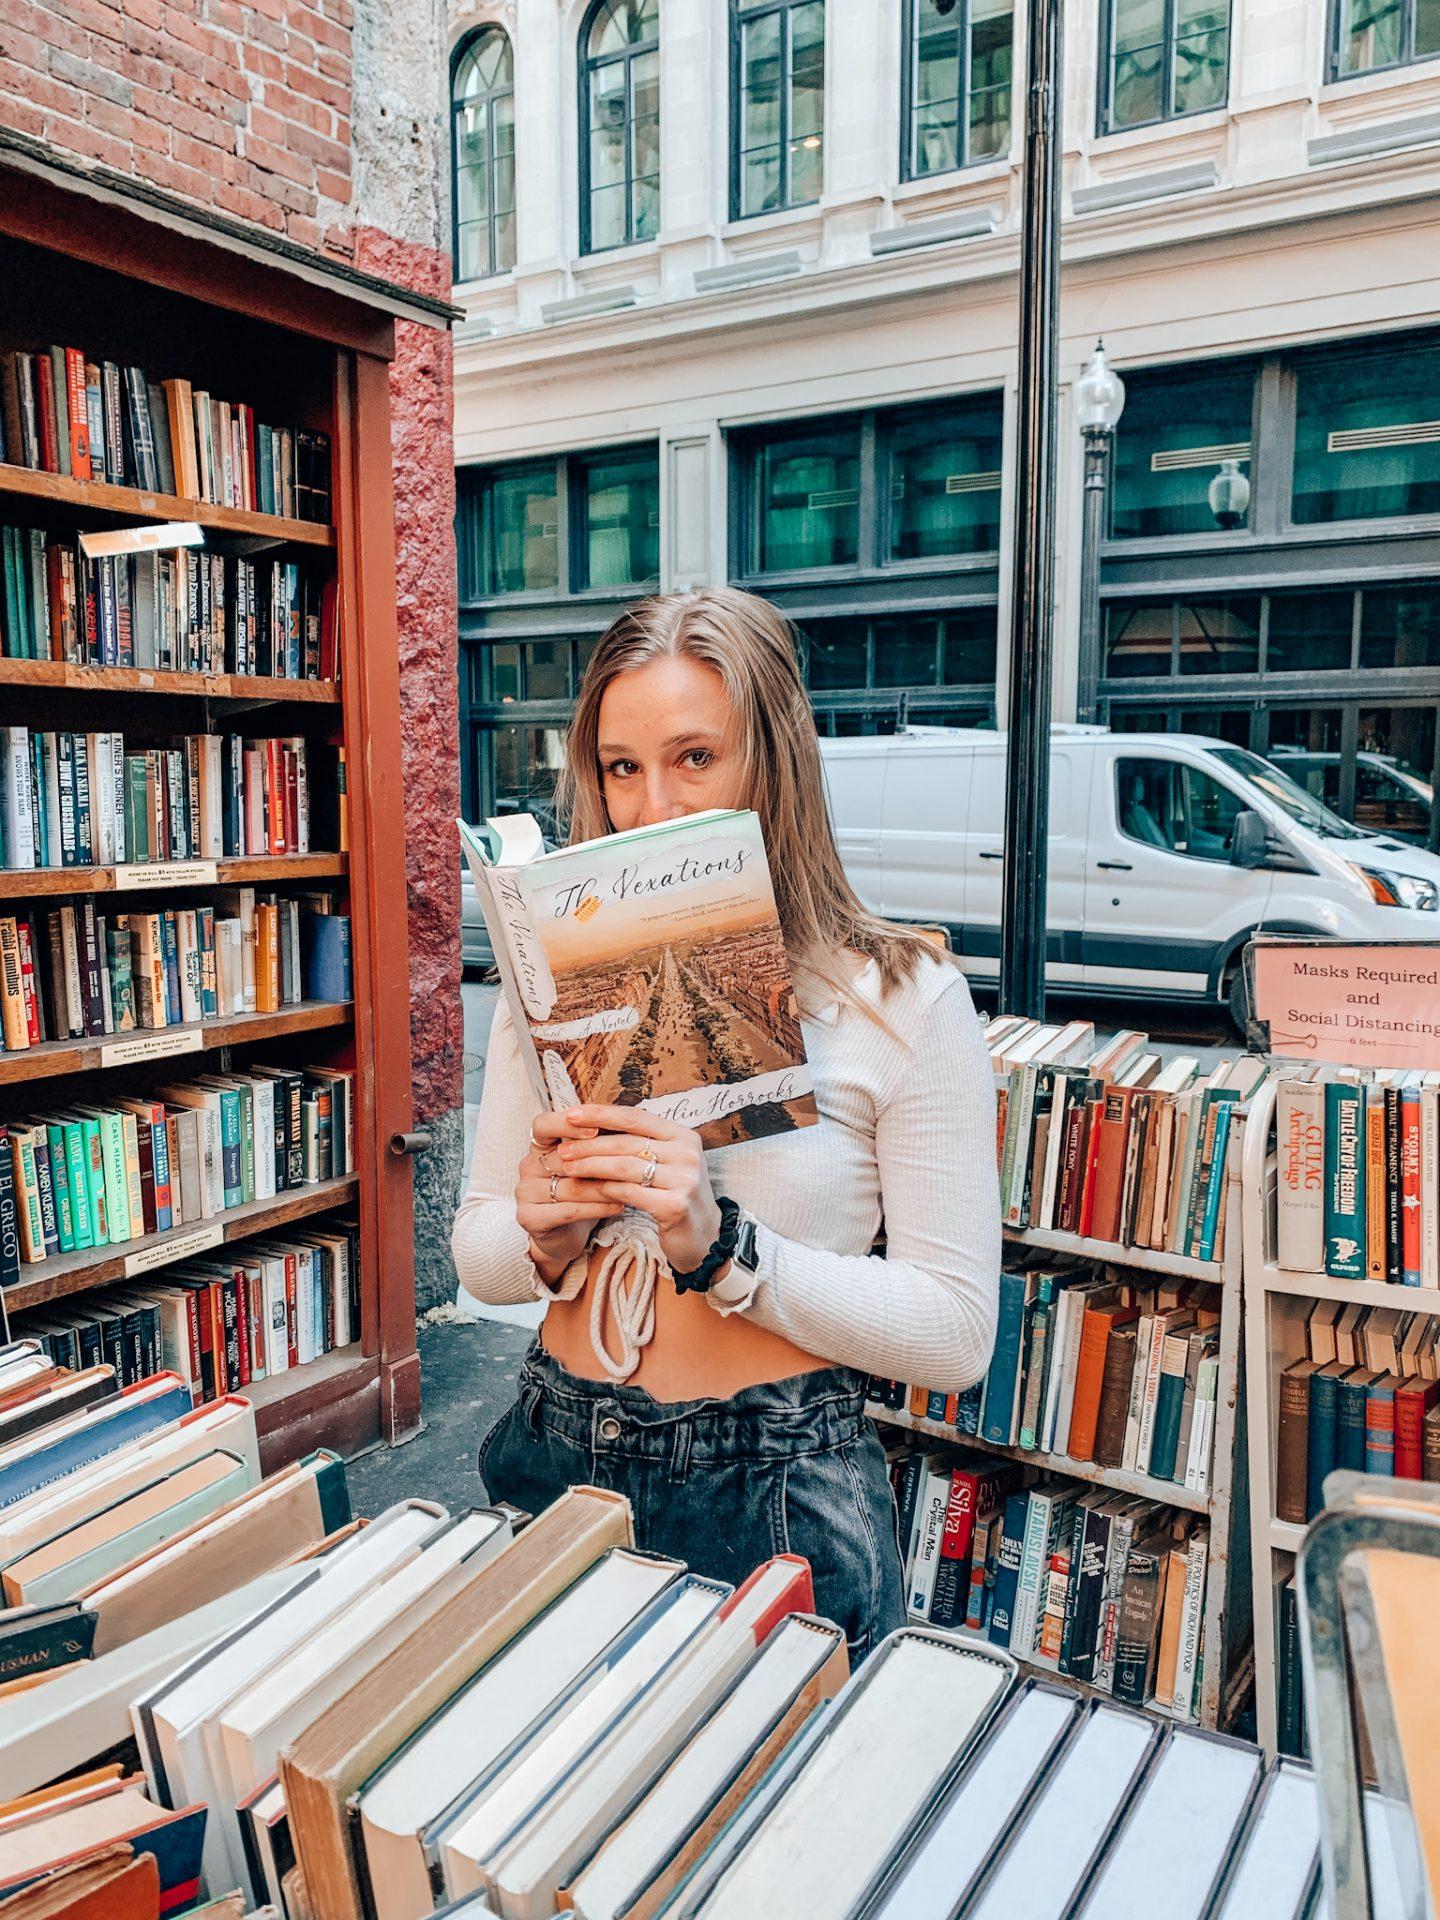 Posing in the stacks of Brattle Bookshop in Boston